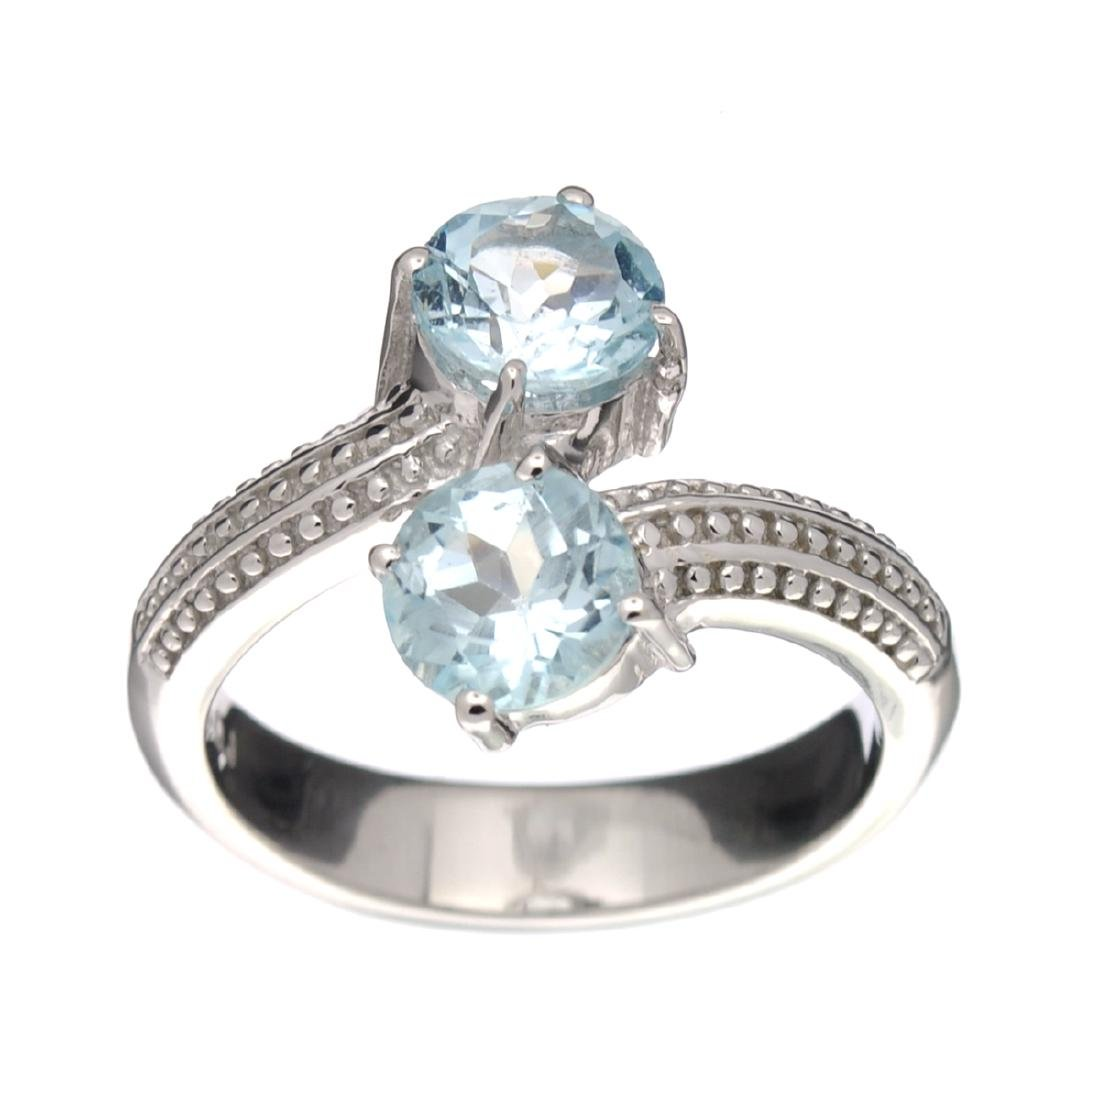 APP: 0.5k Fine Jewelry 2.10CT Round Cut Blue Topaz And